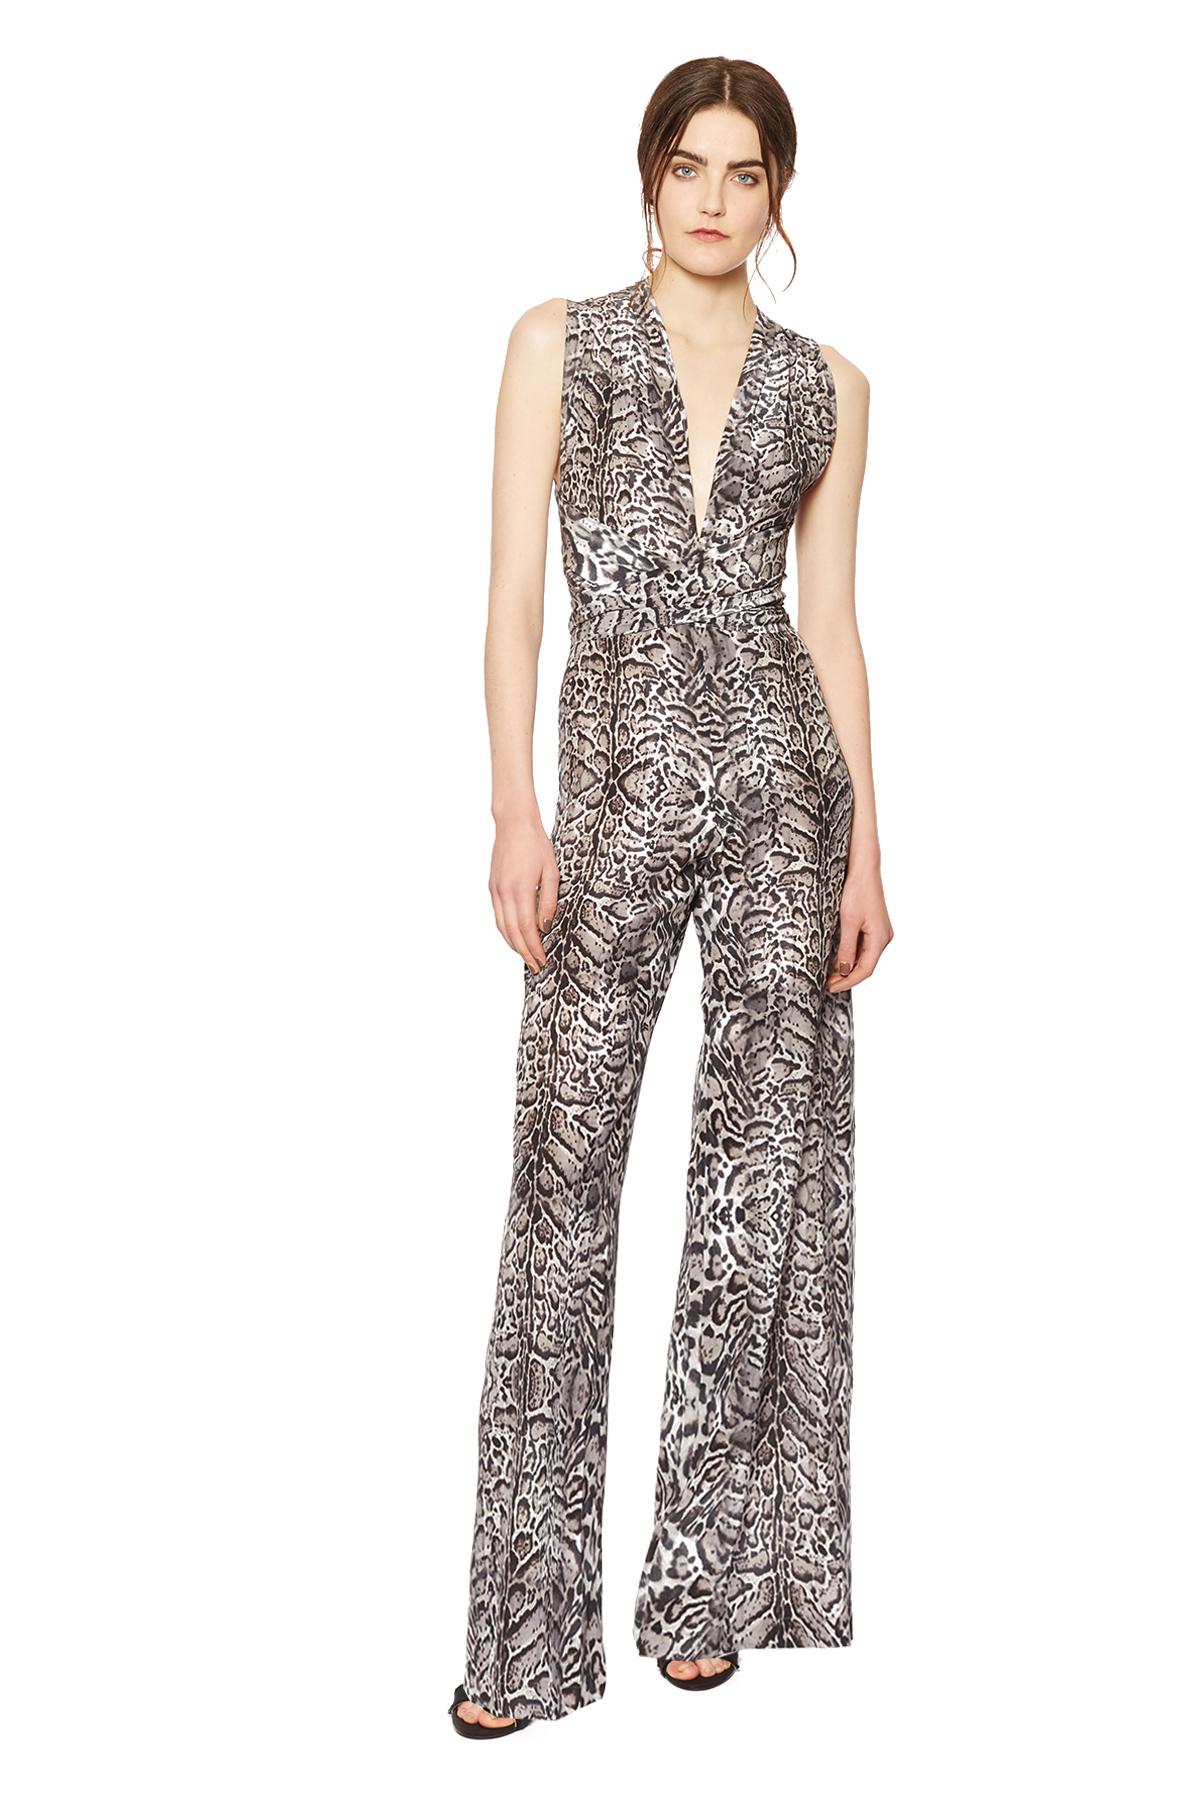 5335b4876ee3 Lyst - Amanda wakeley Delray Silver Leopard Print Jumpsuit .